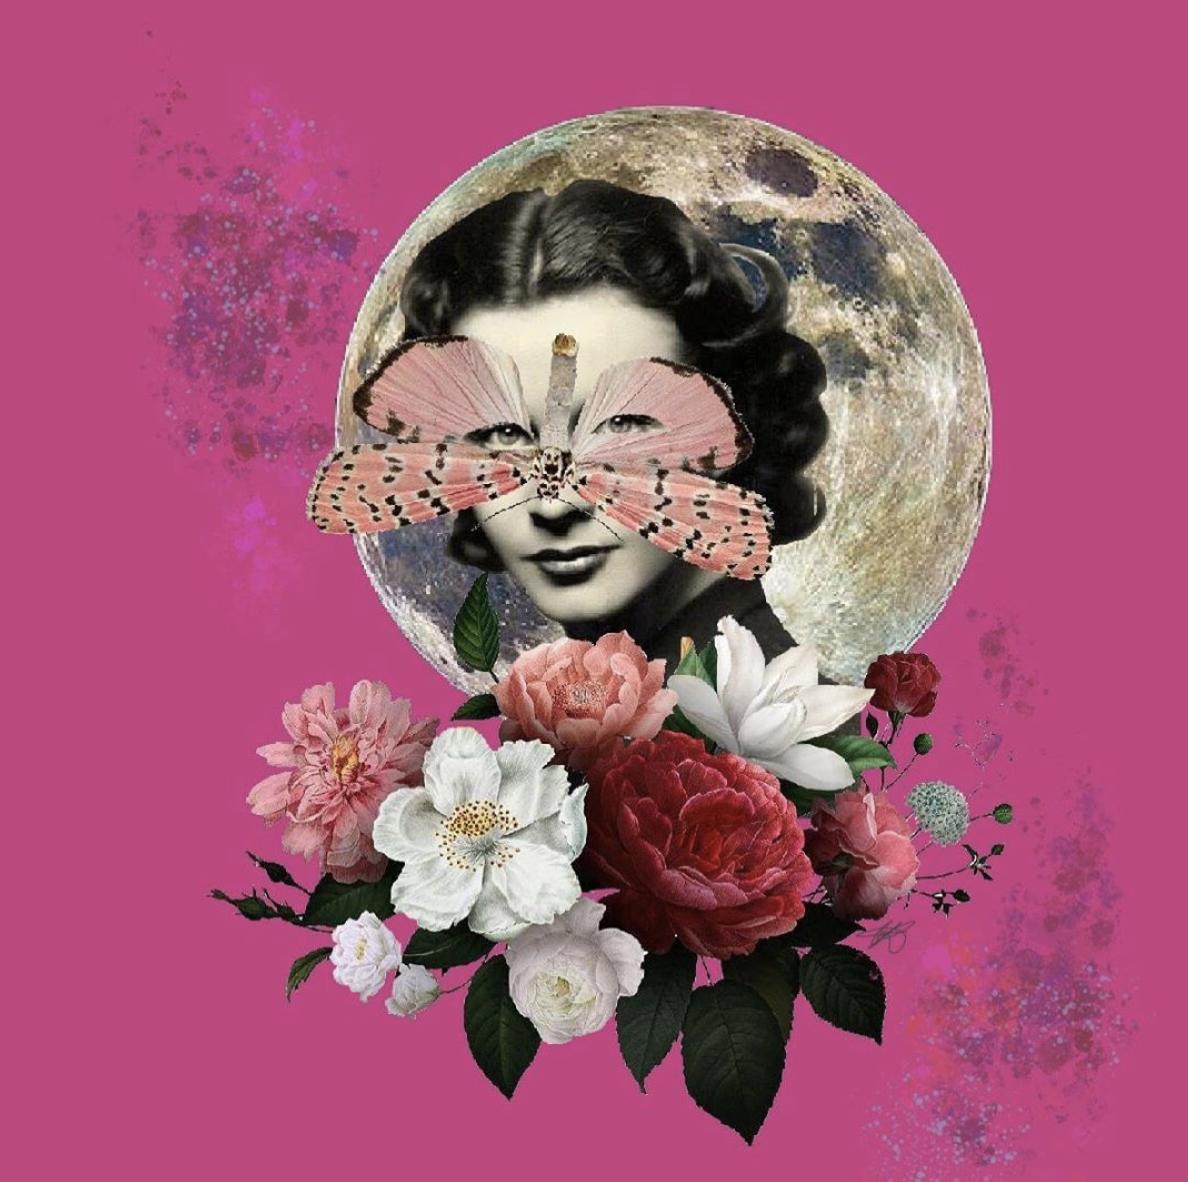 La super luna llena en Libra aumenta tu curiosidad